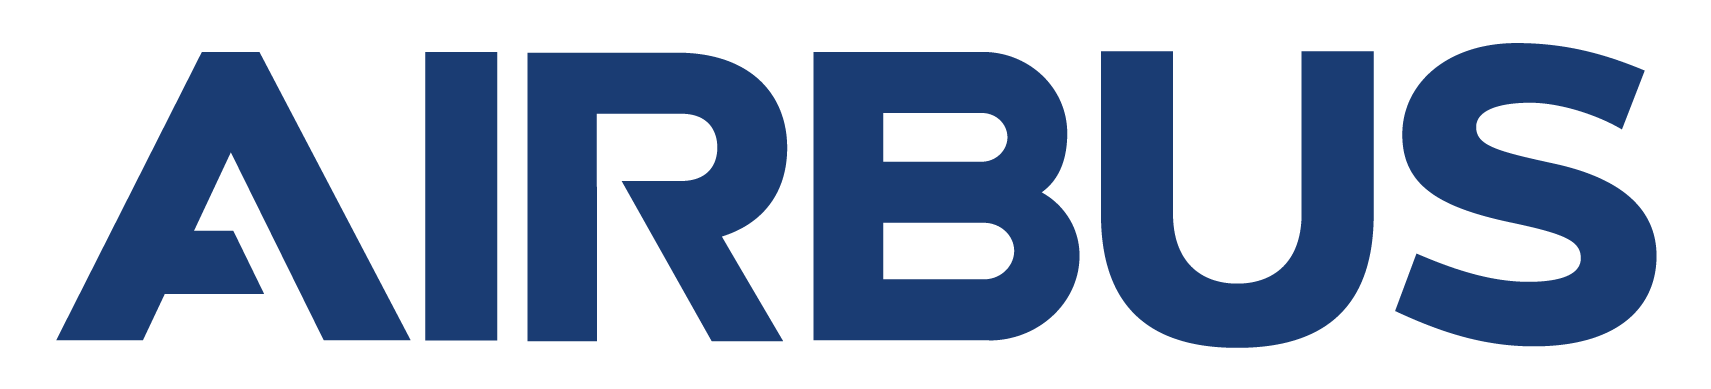 Airbus Logo (No Background)